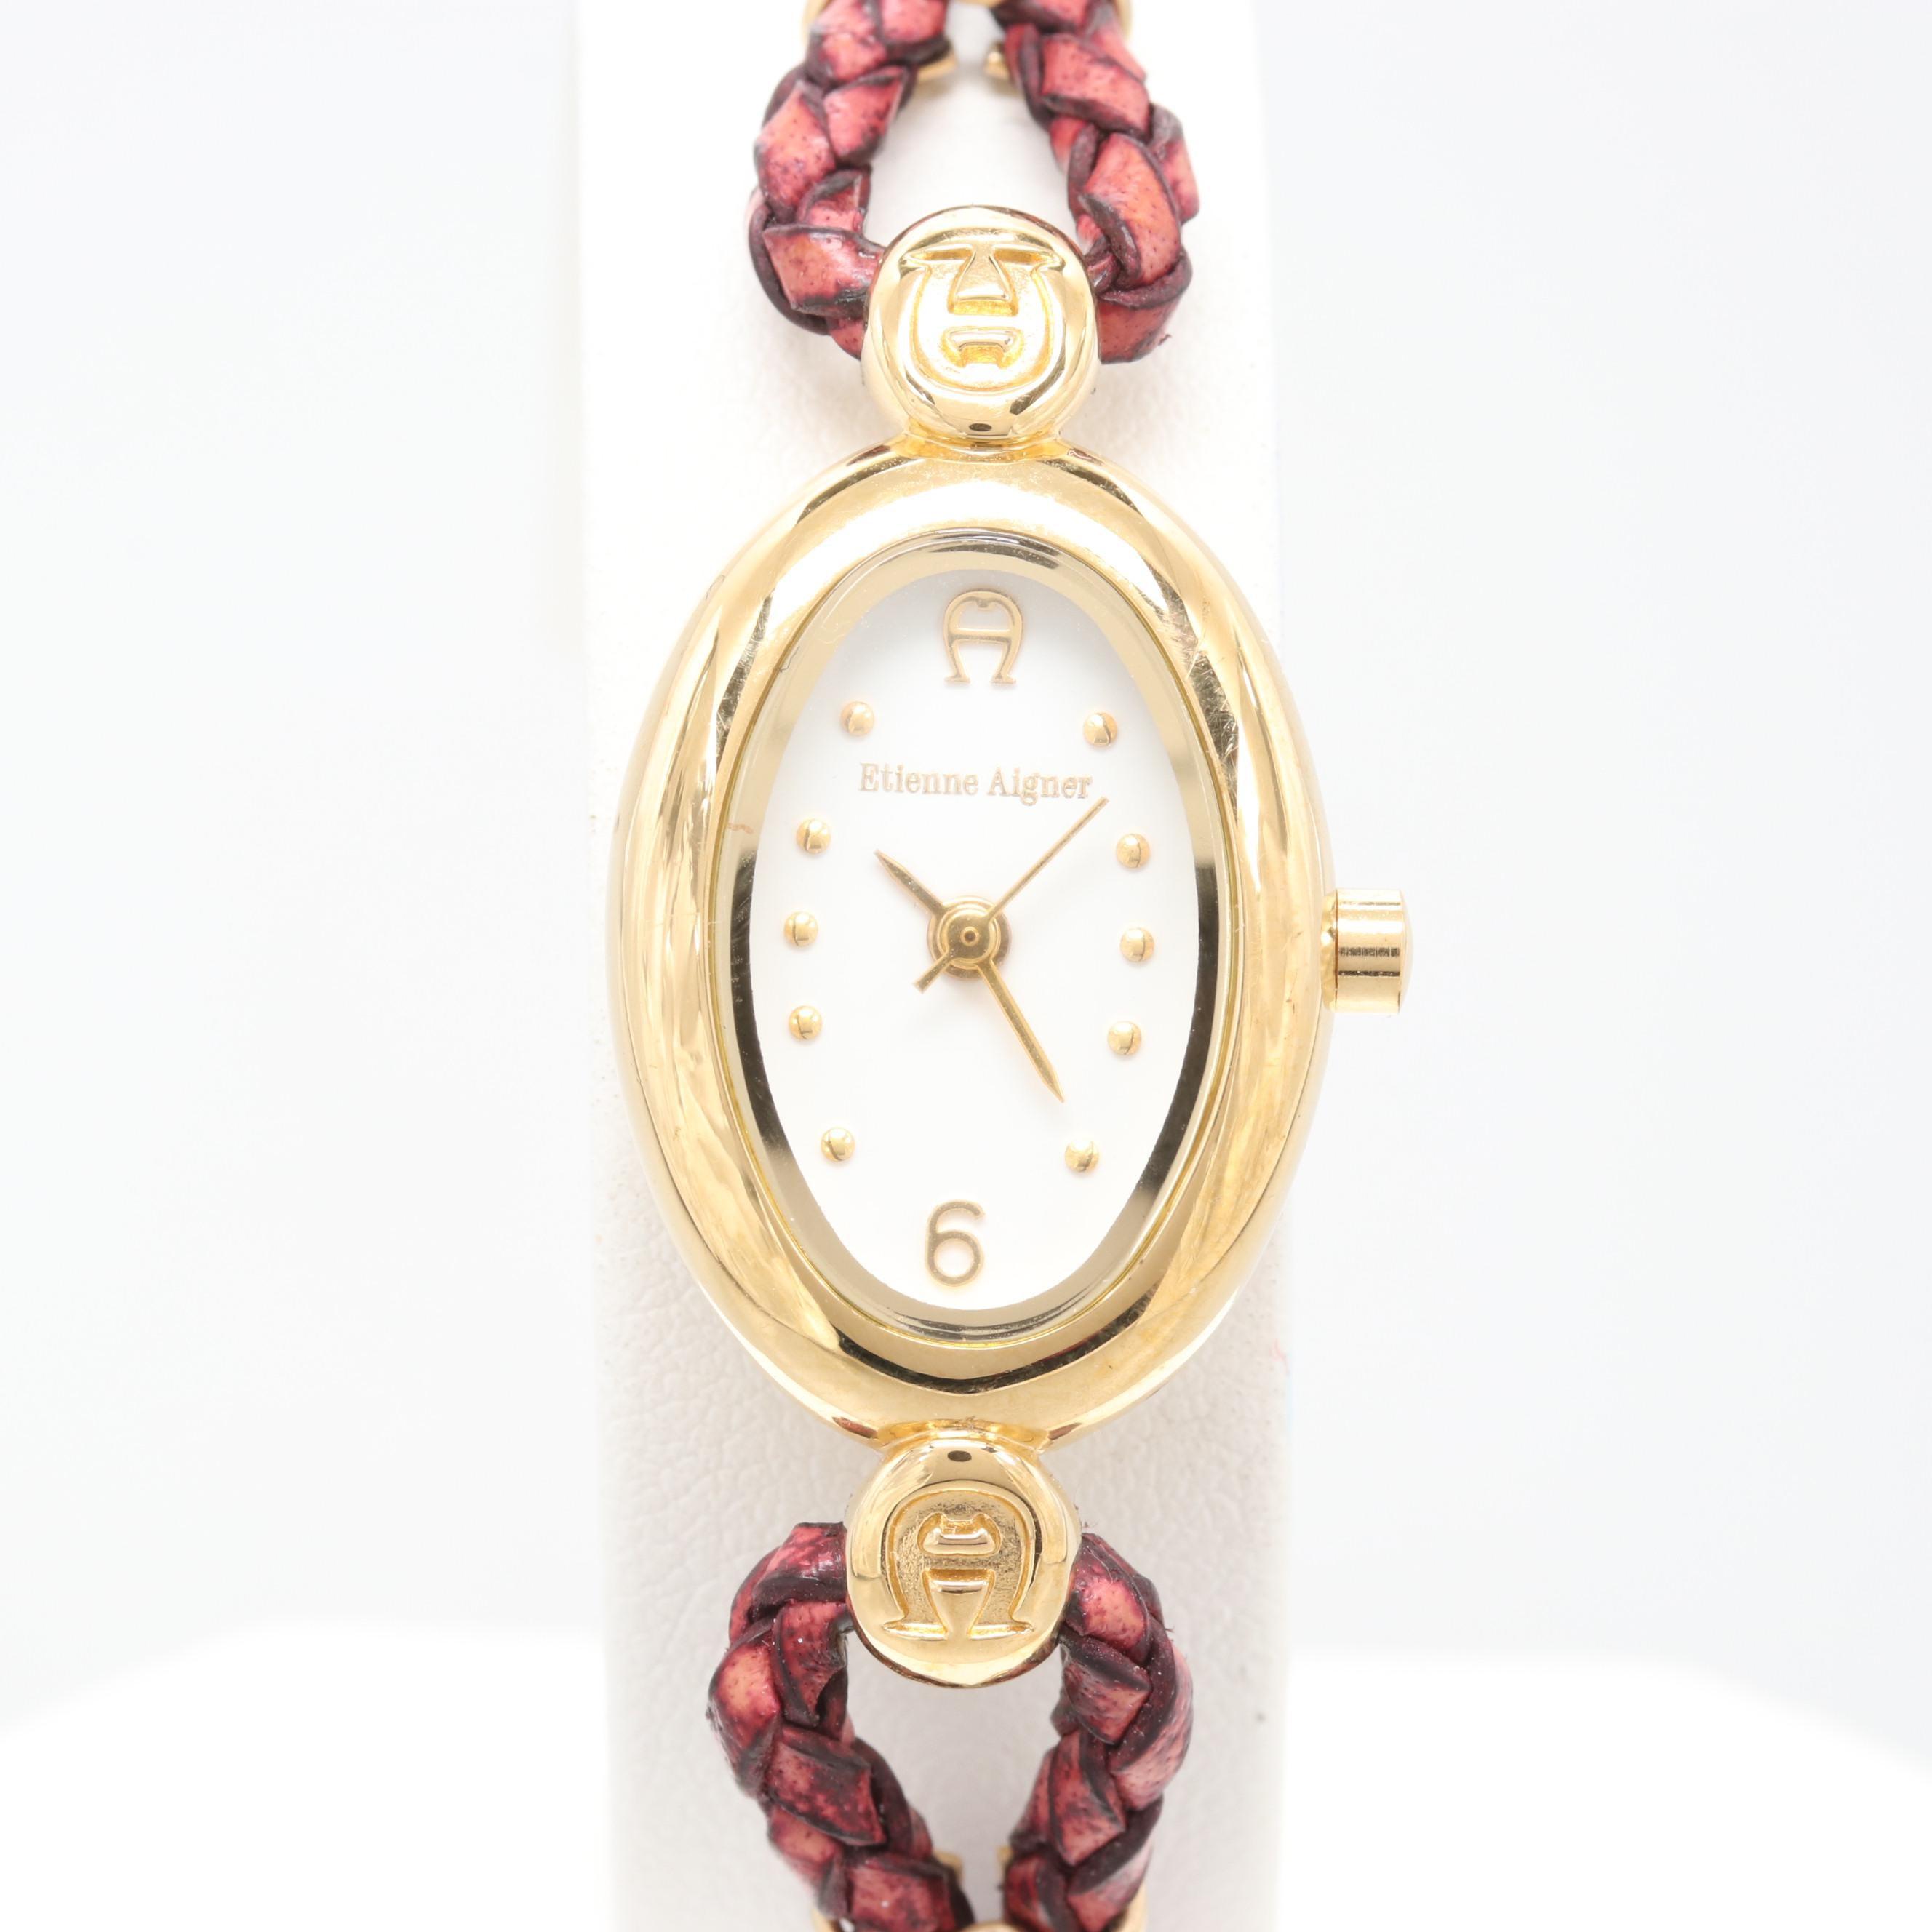 Etienne Aigner Gold Tone Wristwatch